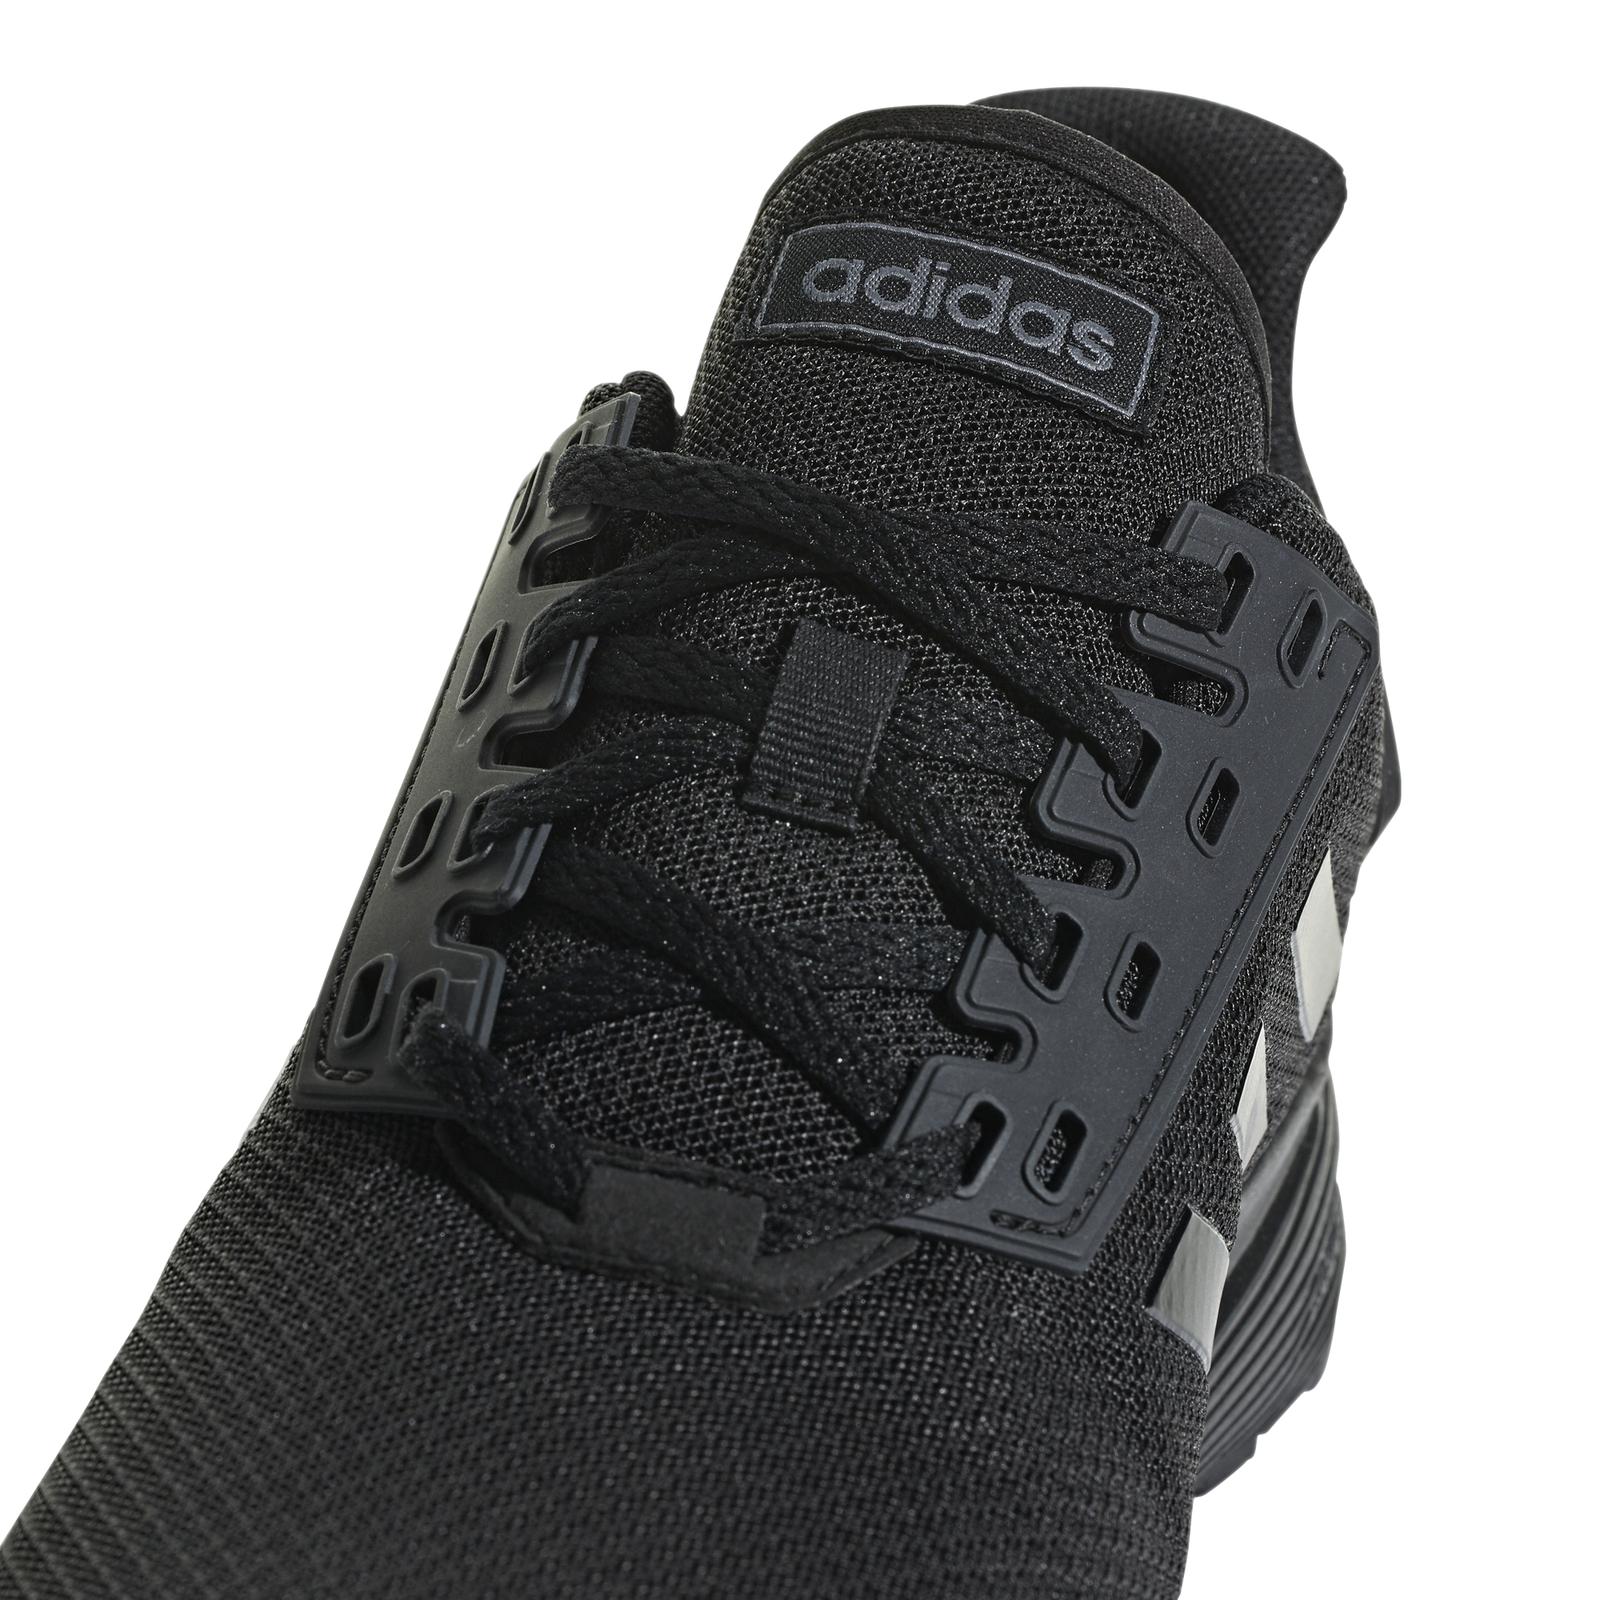 Details about Adidas Duramo 9 Men Men's Running Shoes Leisure Sport Trainers Black b96578 show original title